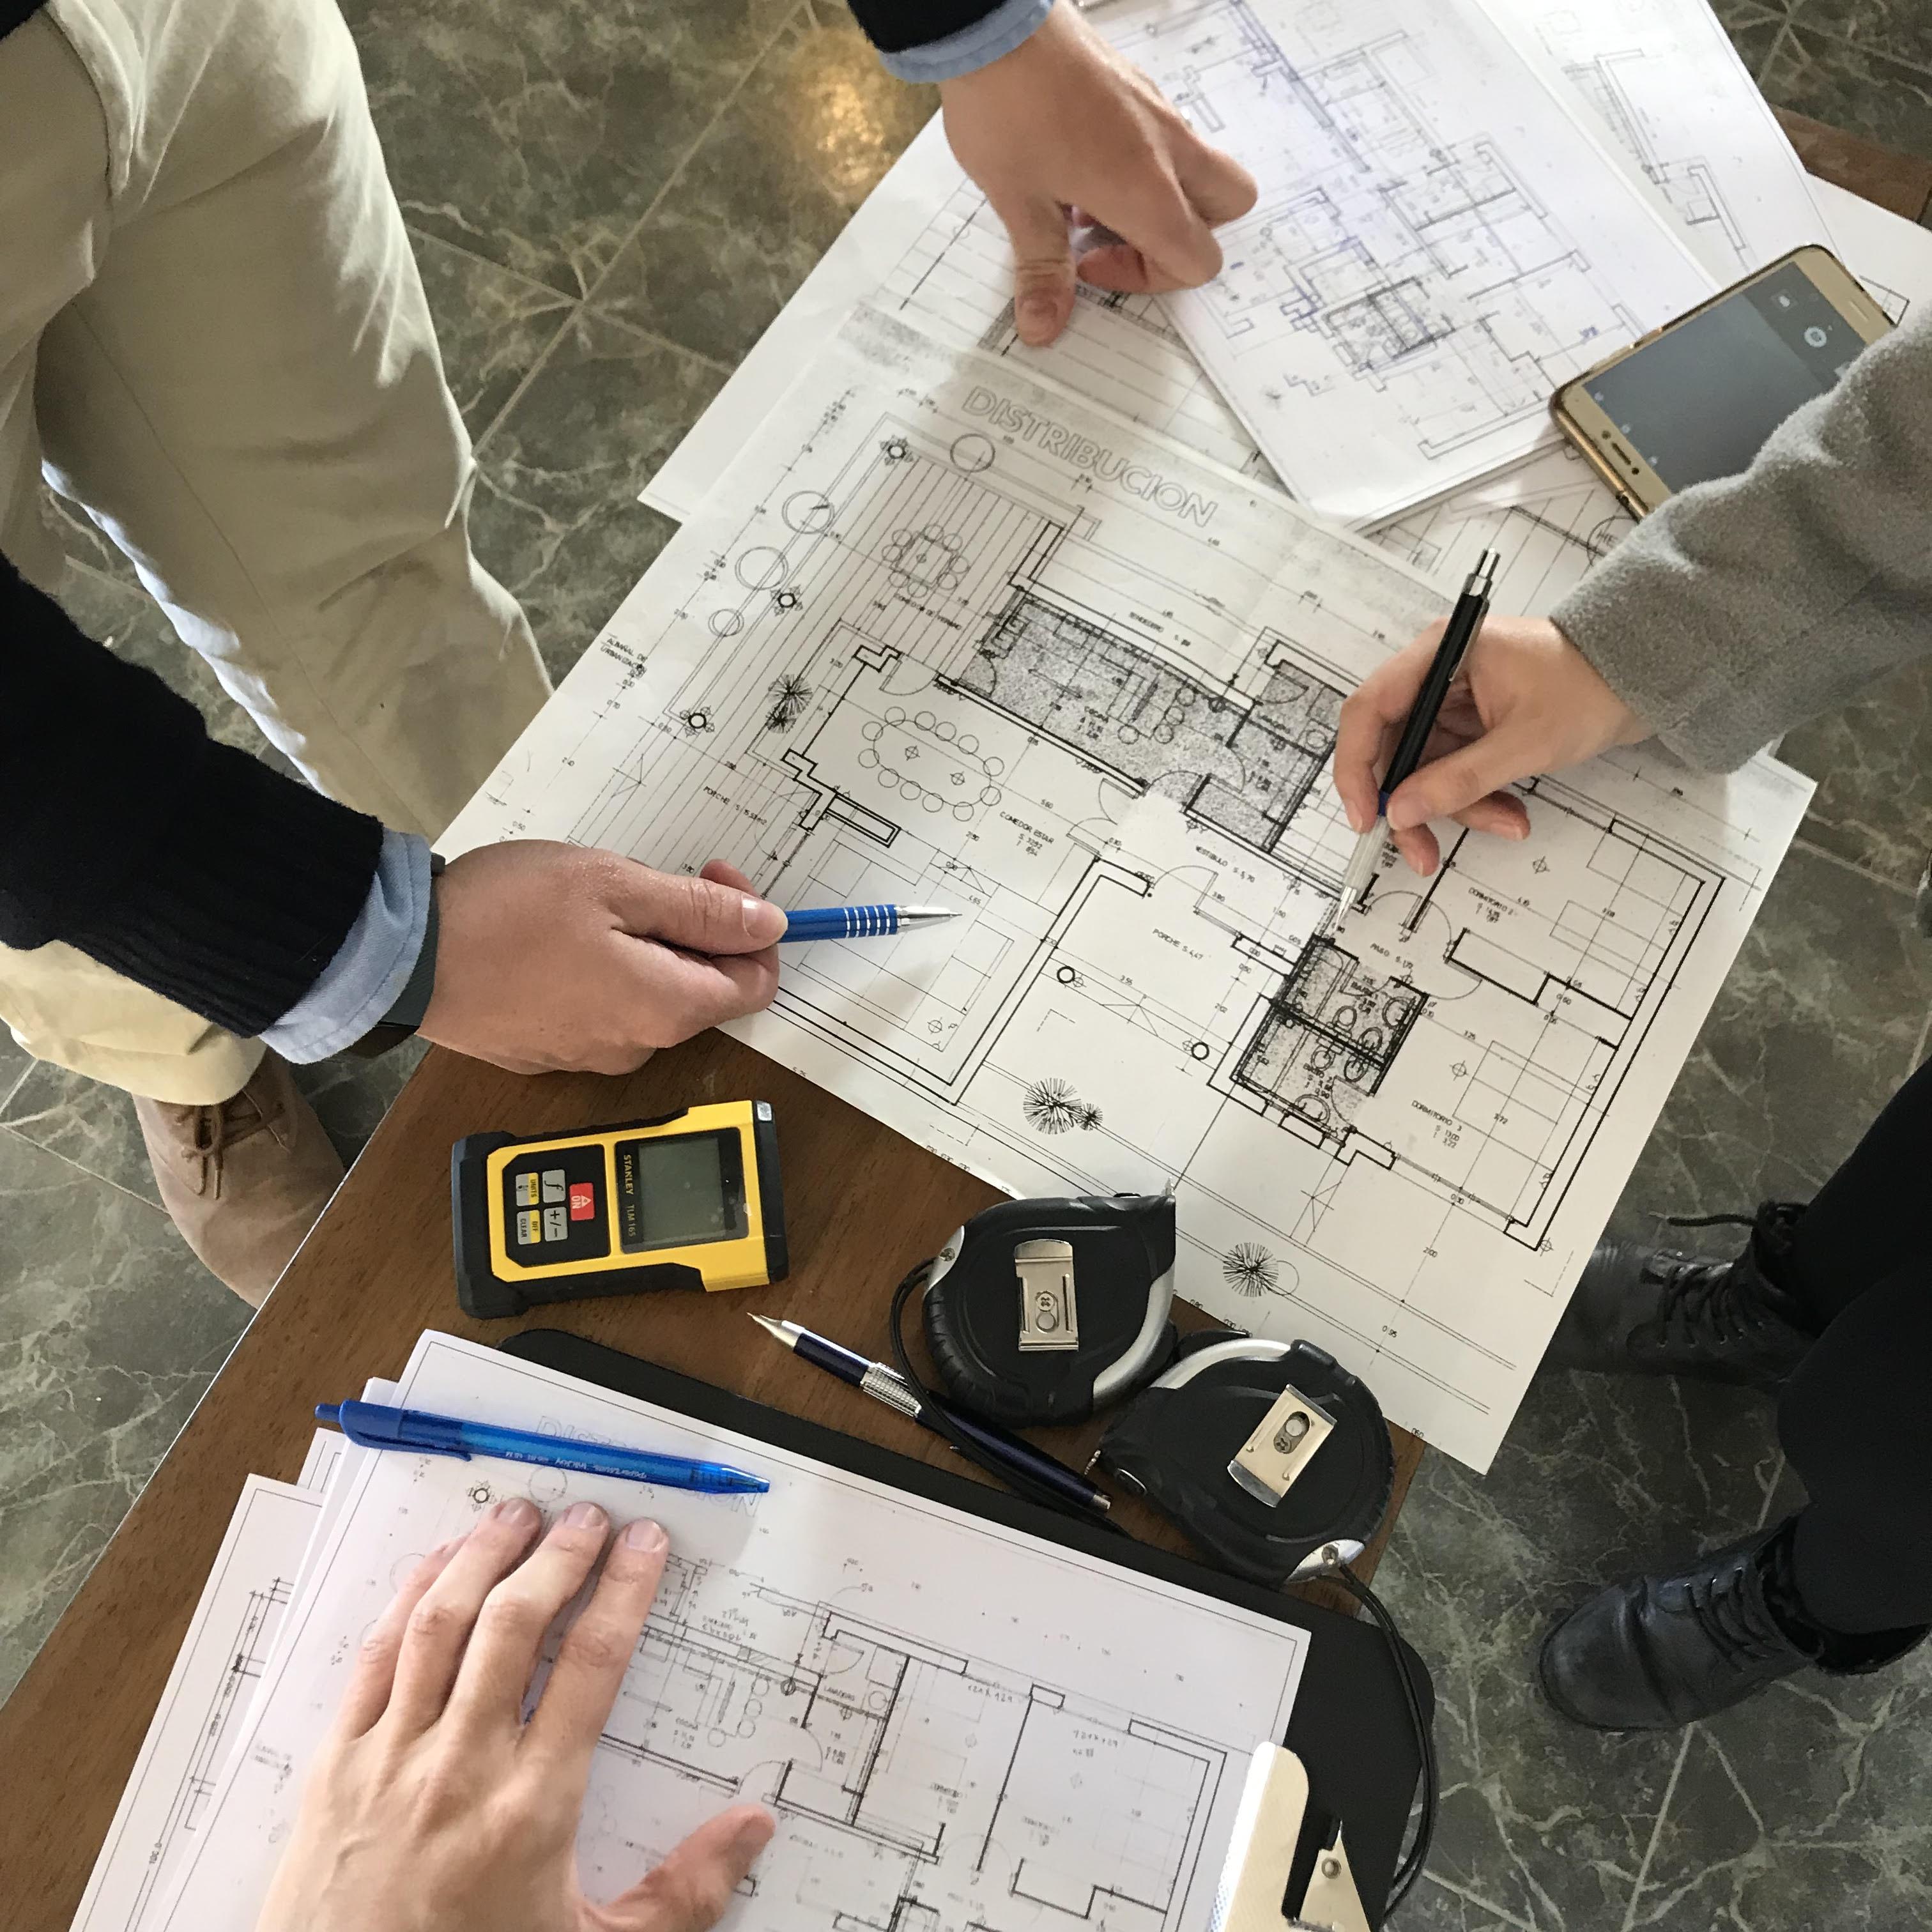 architects-sitges-barcelona-refurbishments-valpineda-rardo-06